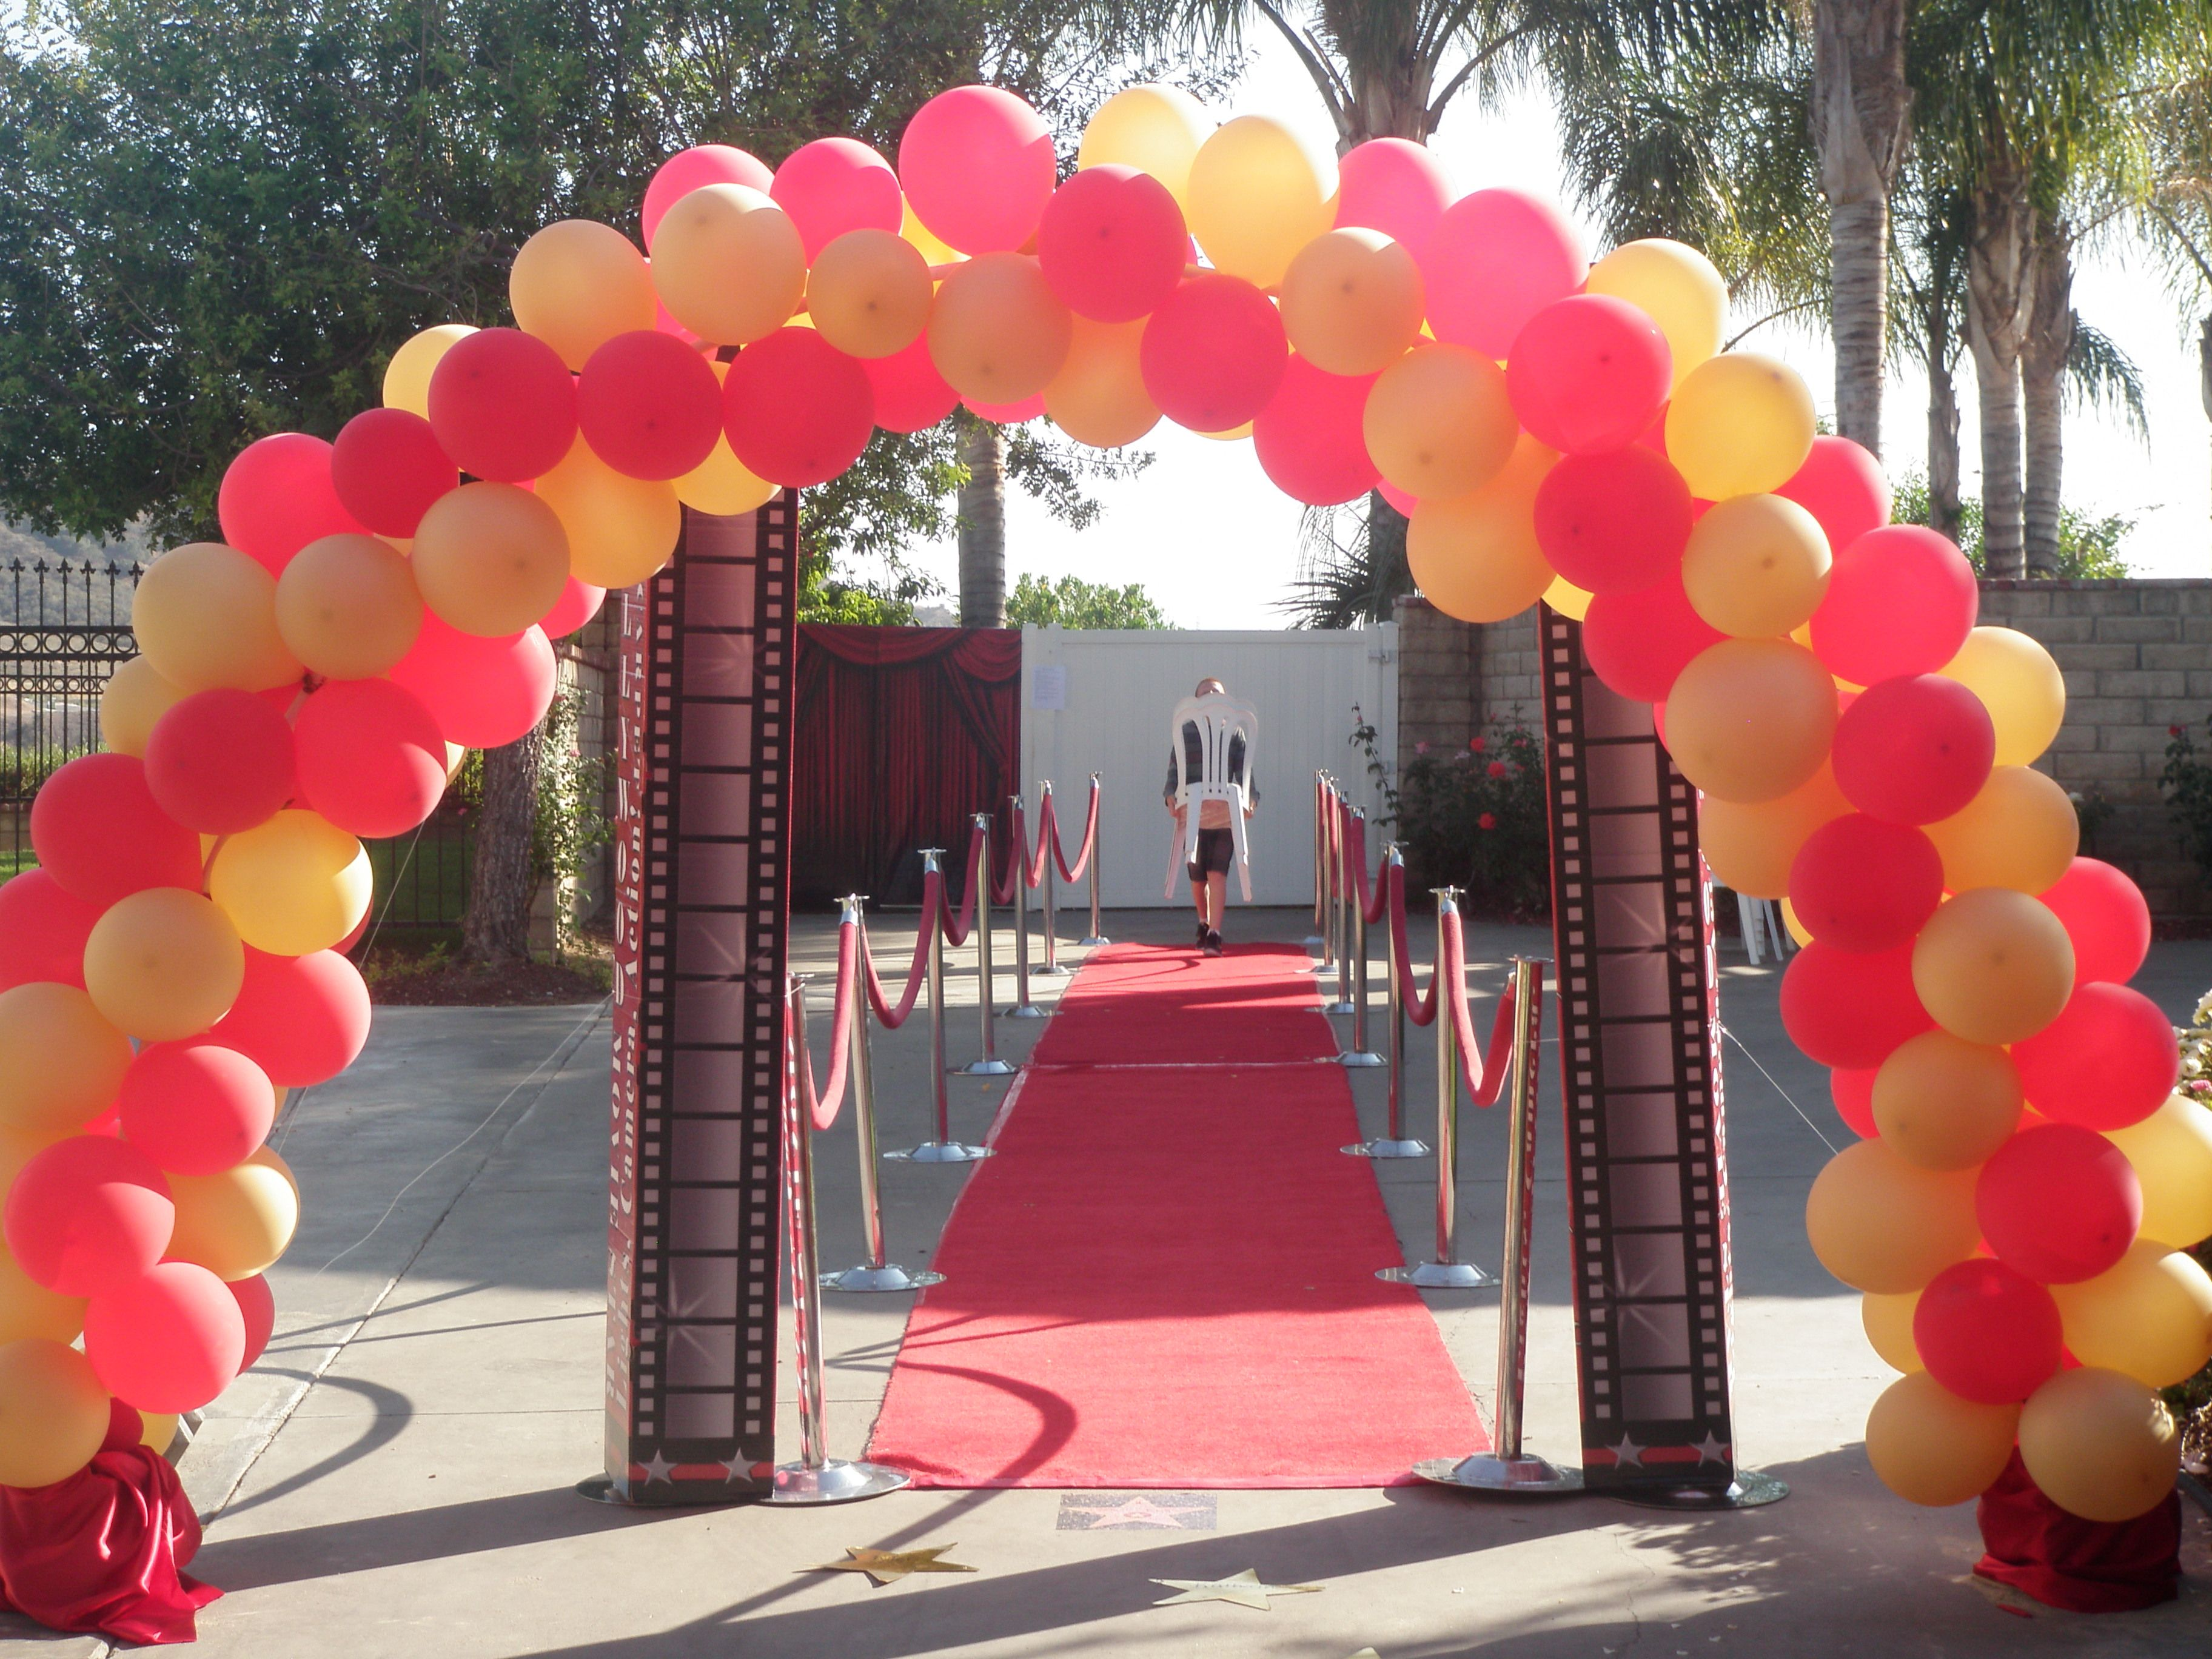 Red Carpet Graduation Party